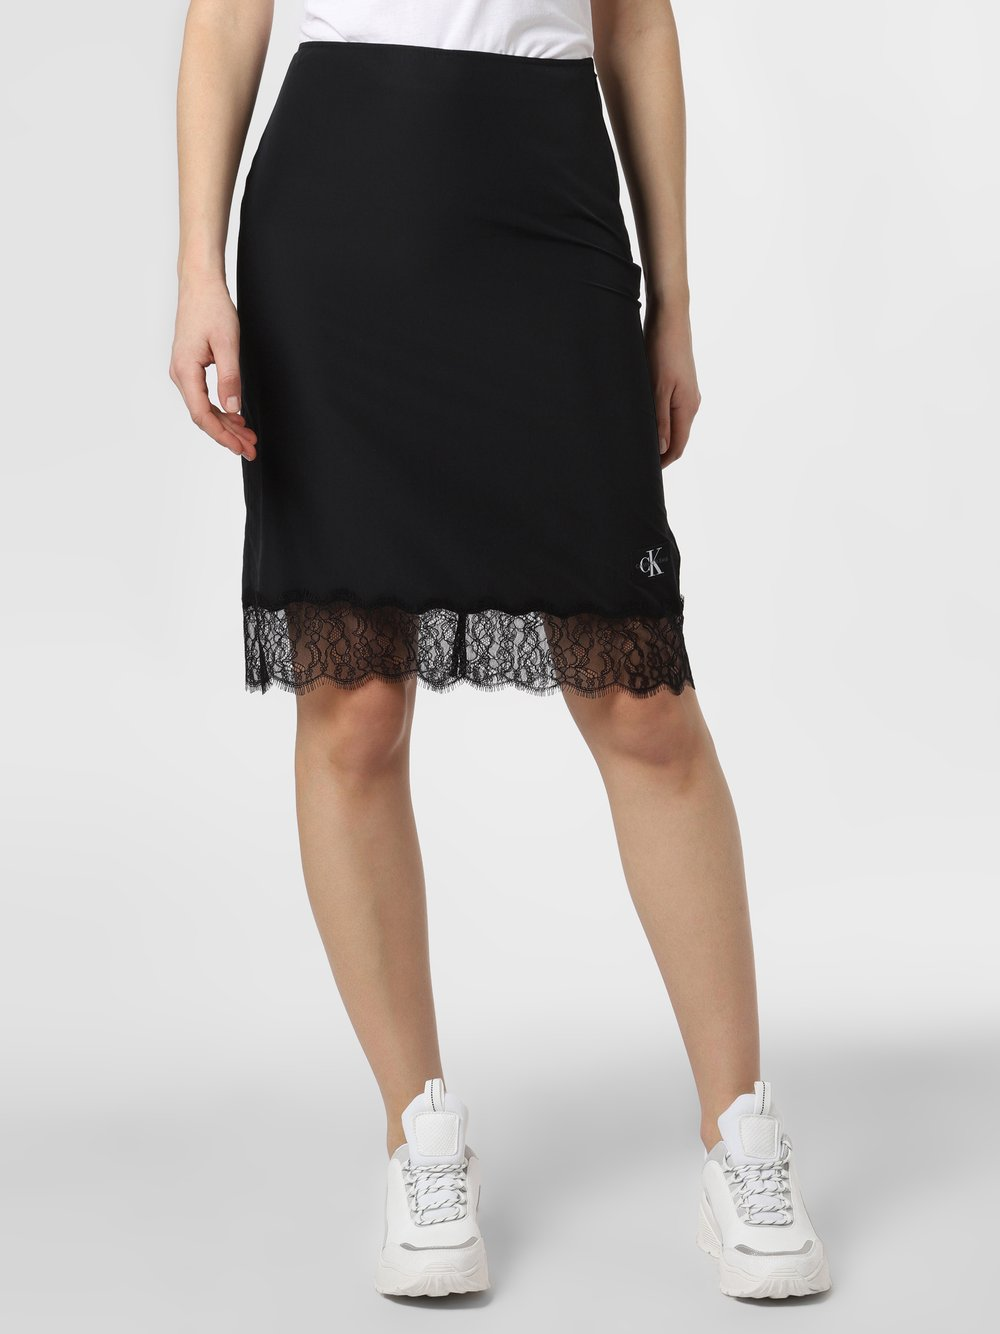 Calvin Klein Jeans - Spódnica damska, czarny